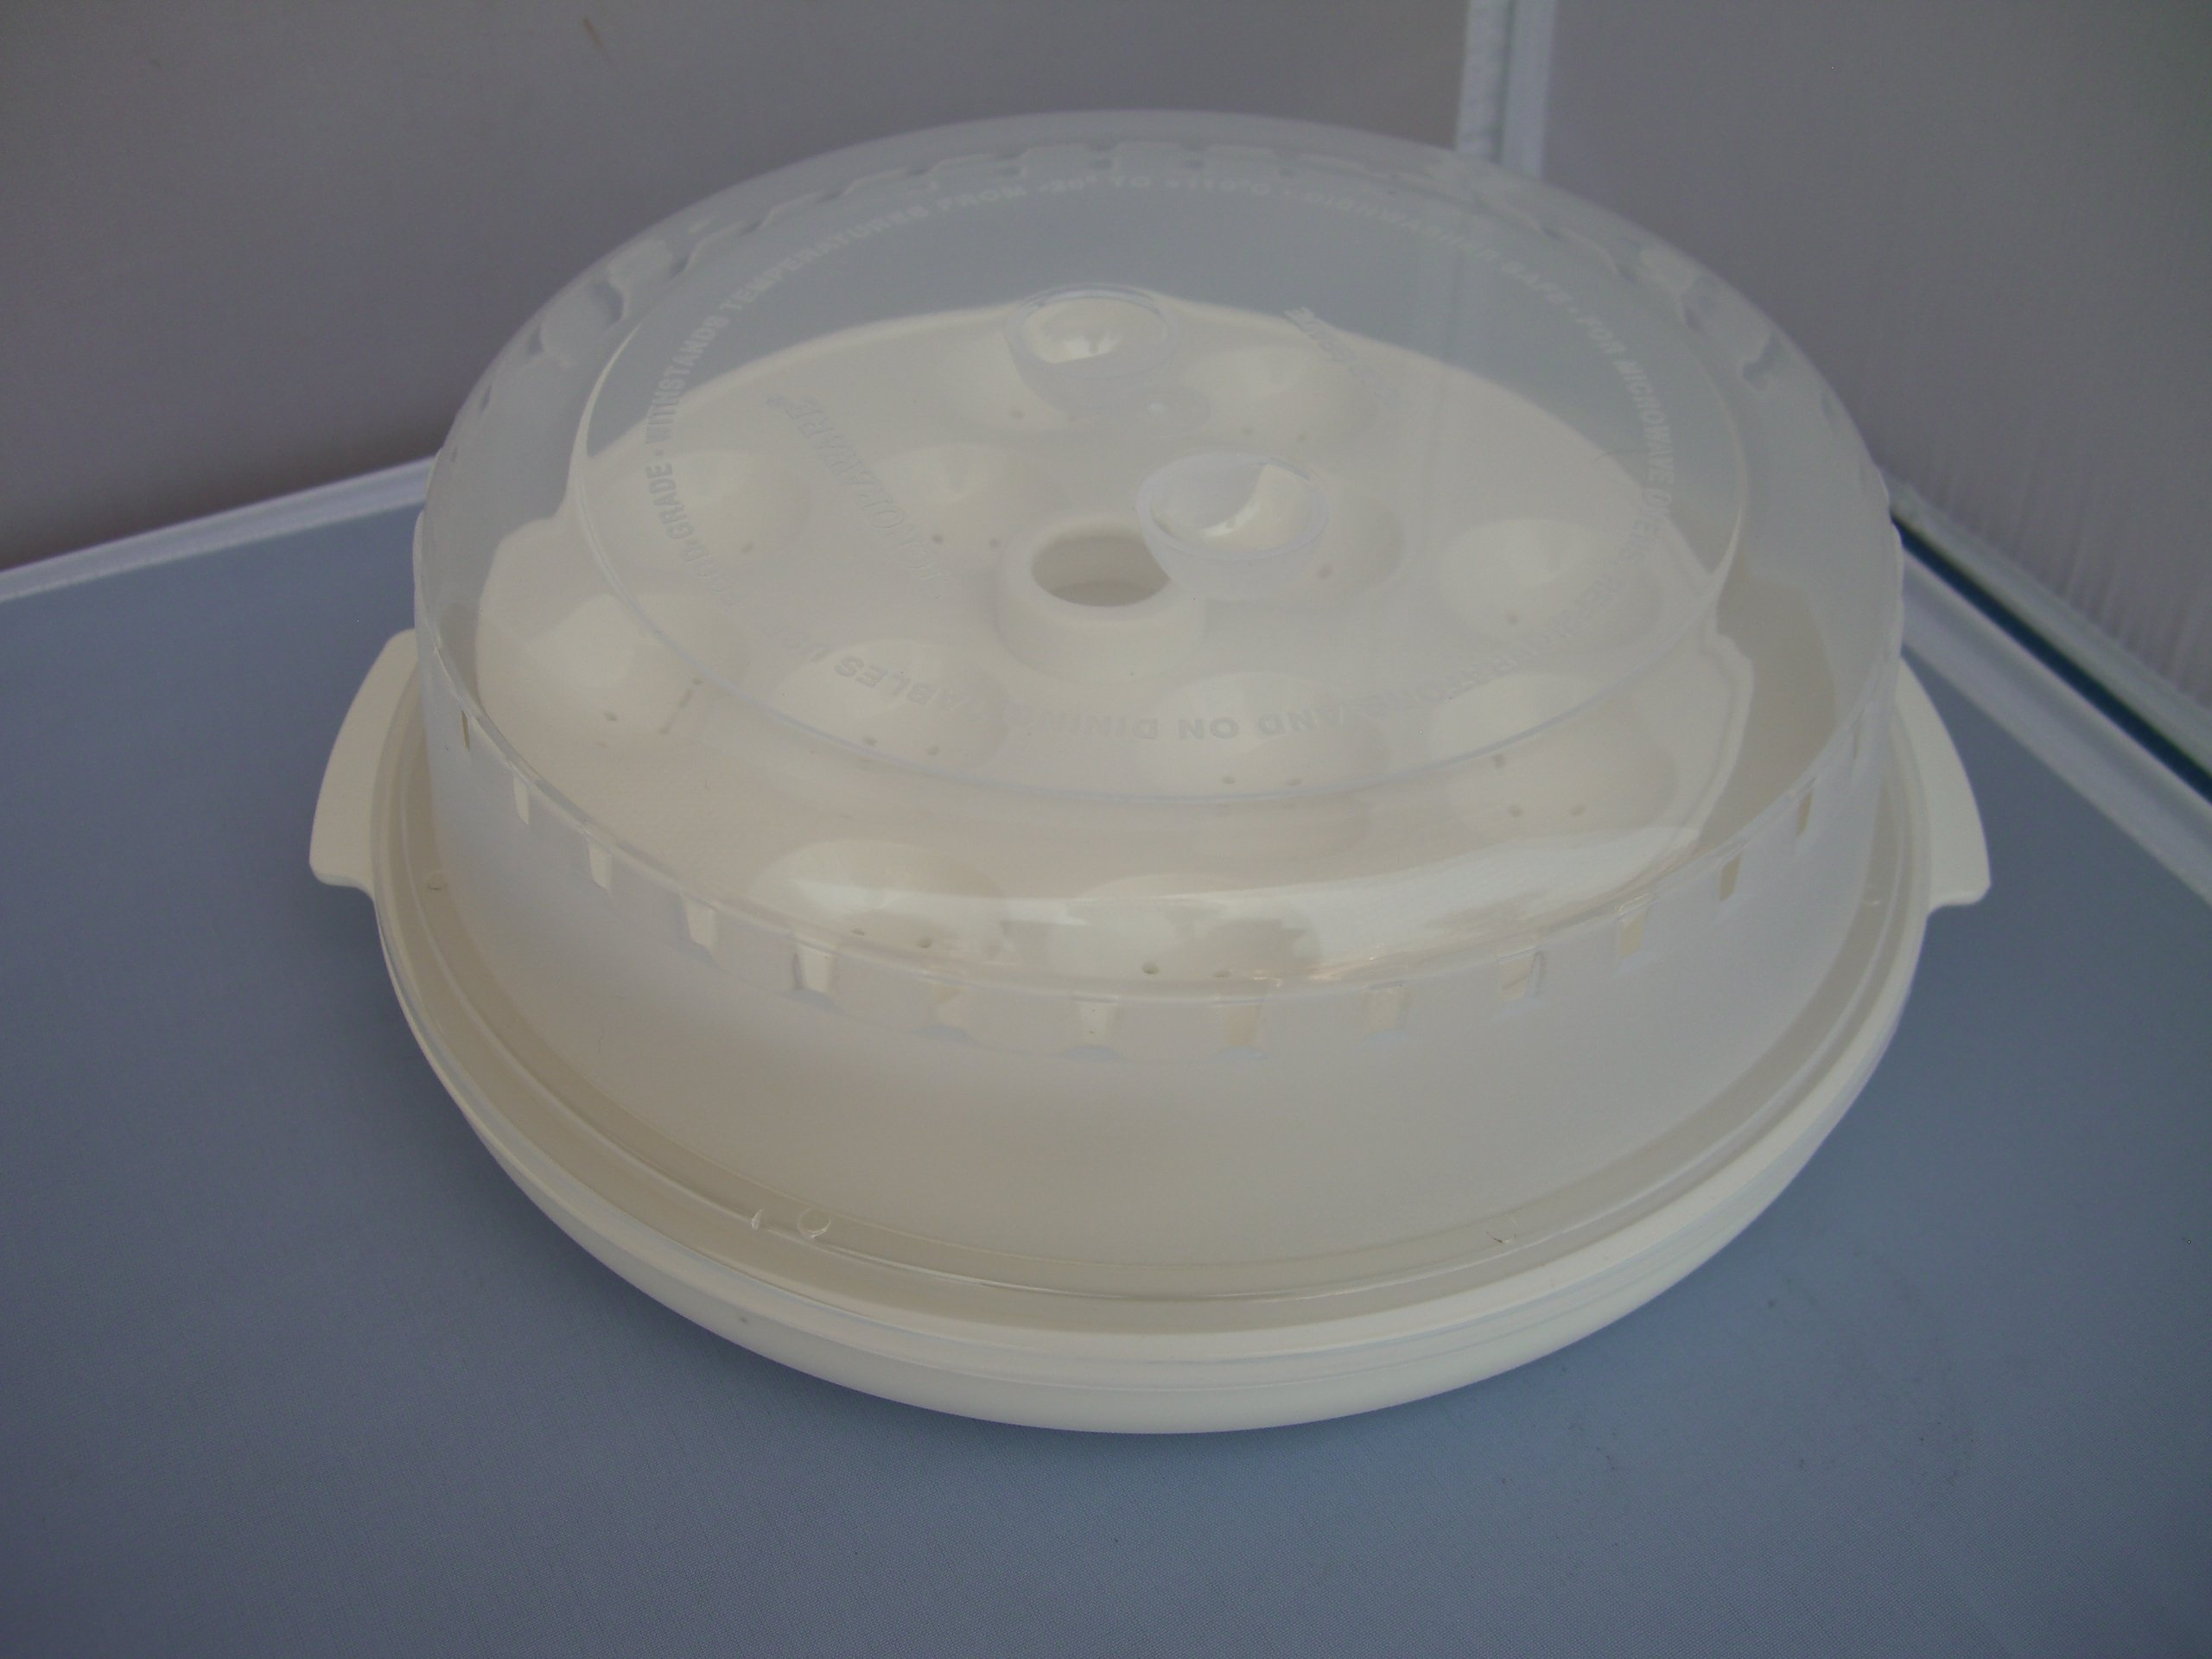 Plastic Signora Ware Mini Idli Microwave Safe Cooker